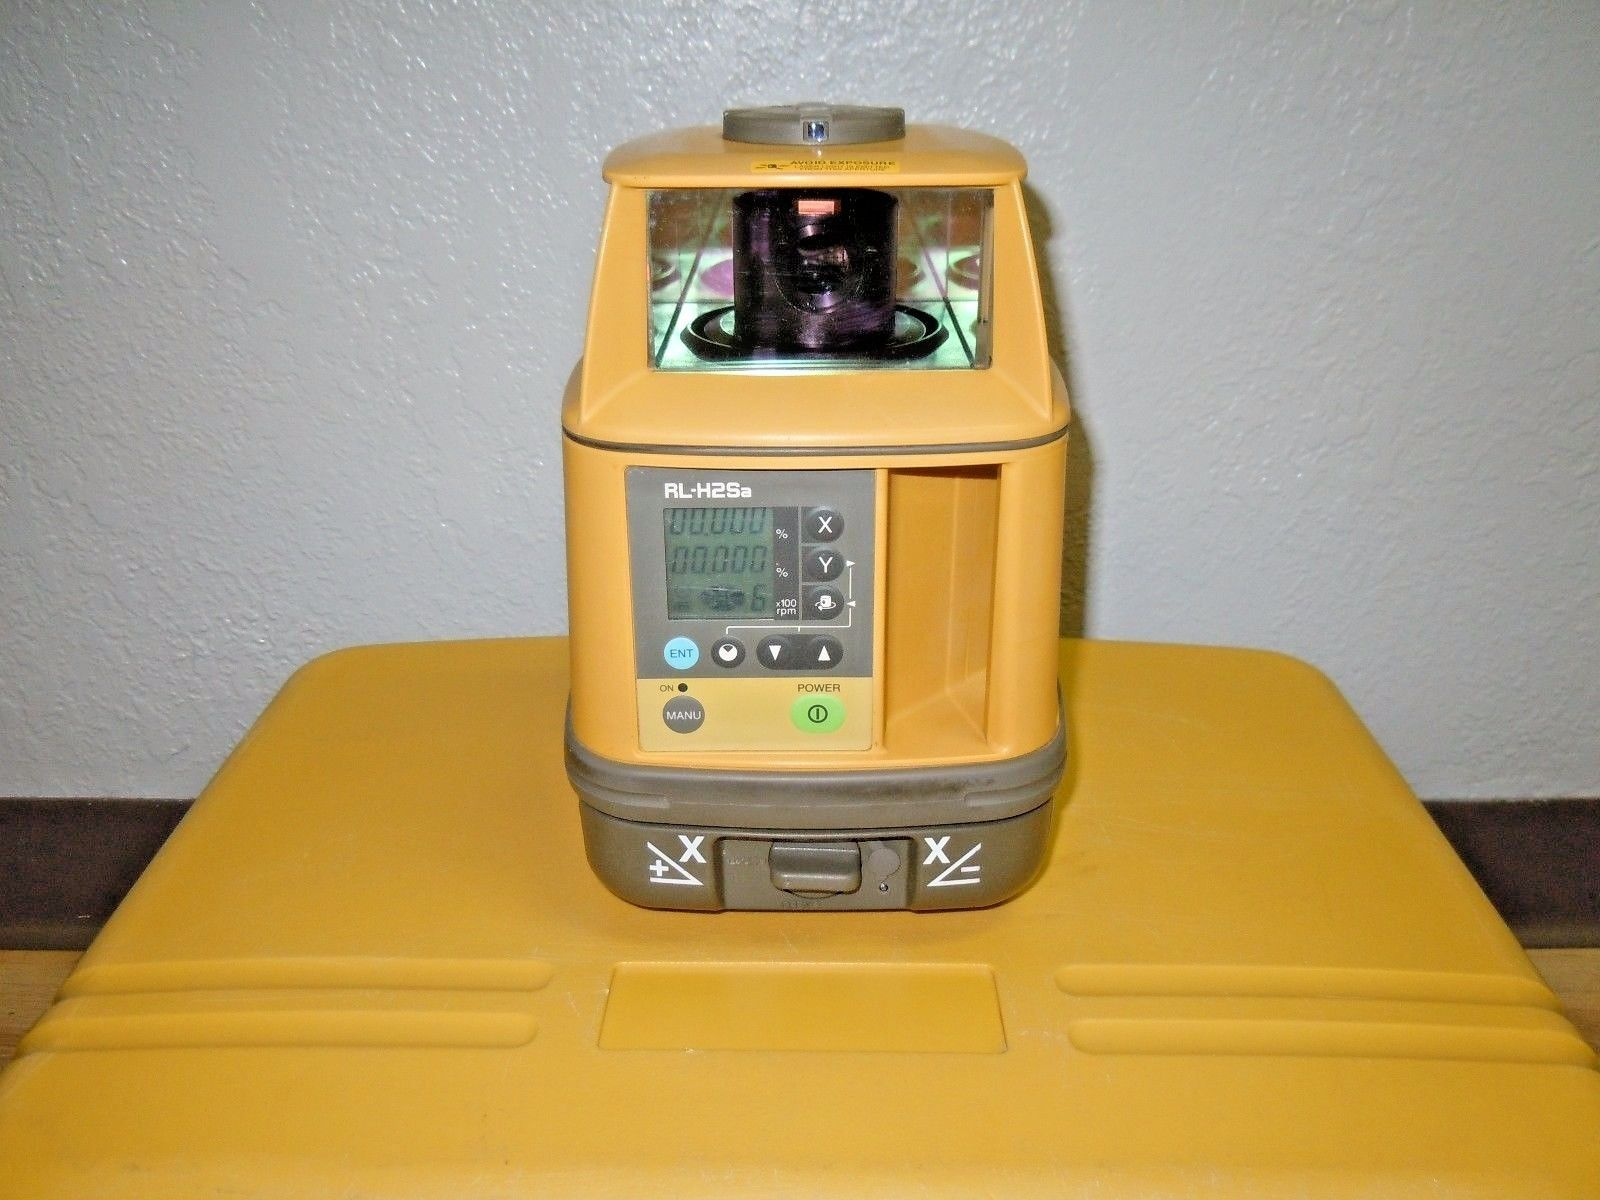 Topcon Rl H2sa Dual Slope Machine Control Grade Laser